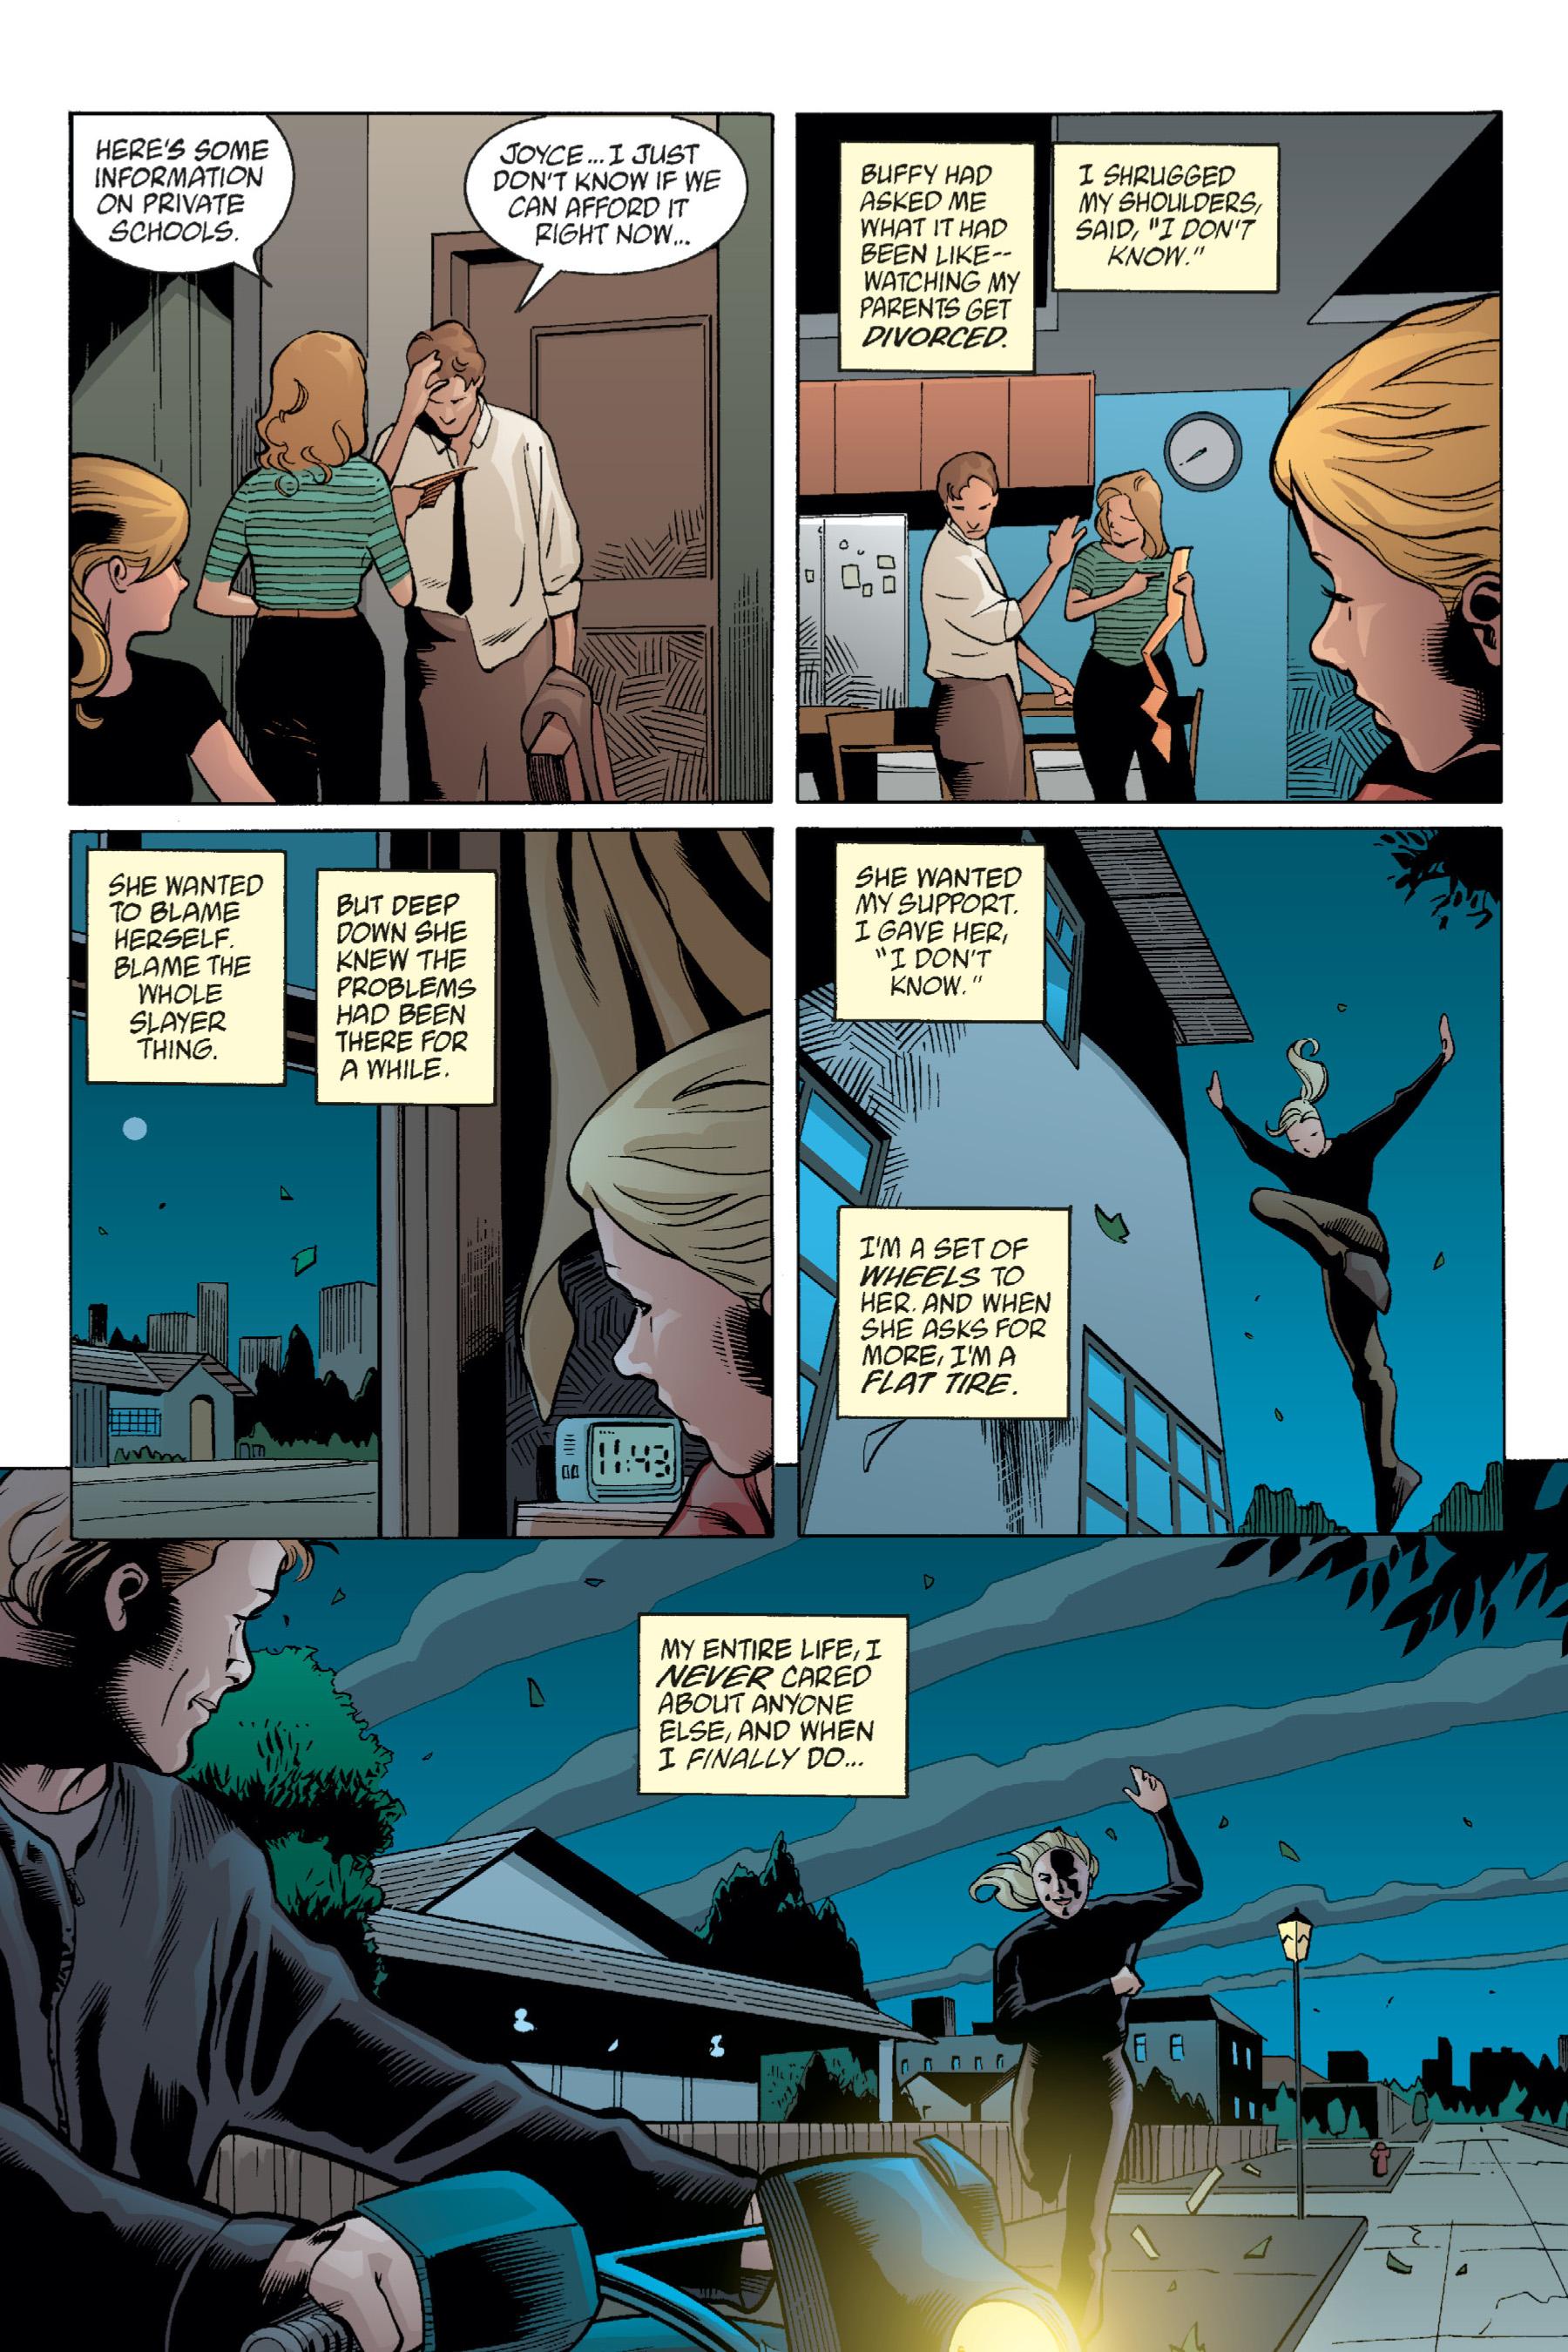 Read online Buffy the Vampire Slayer: Omnibus comic -  Issue # TPB 1 - 116